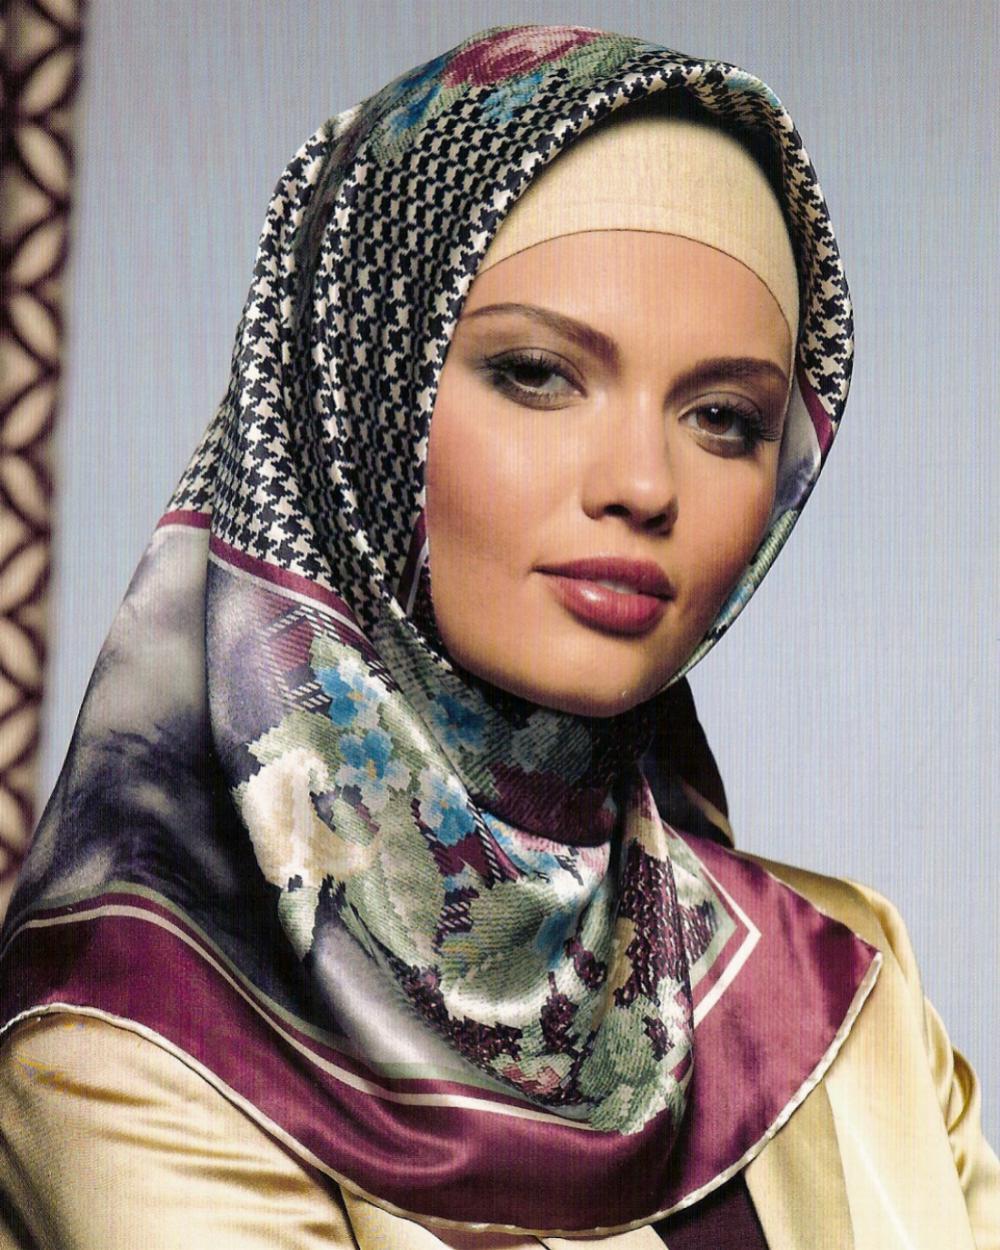 Özer Khalid - Renaissance: I Am A Muslim Girl